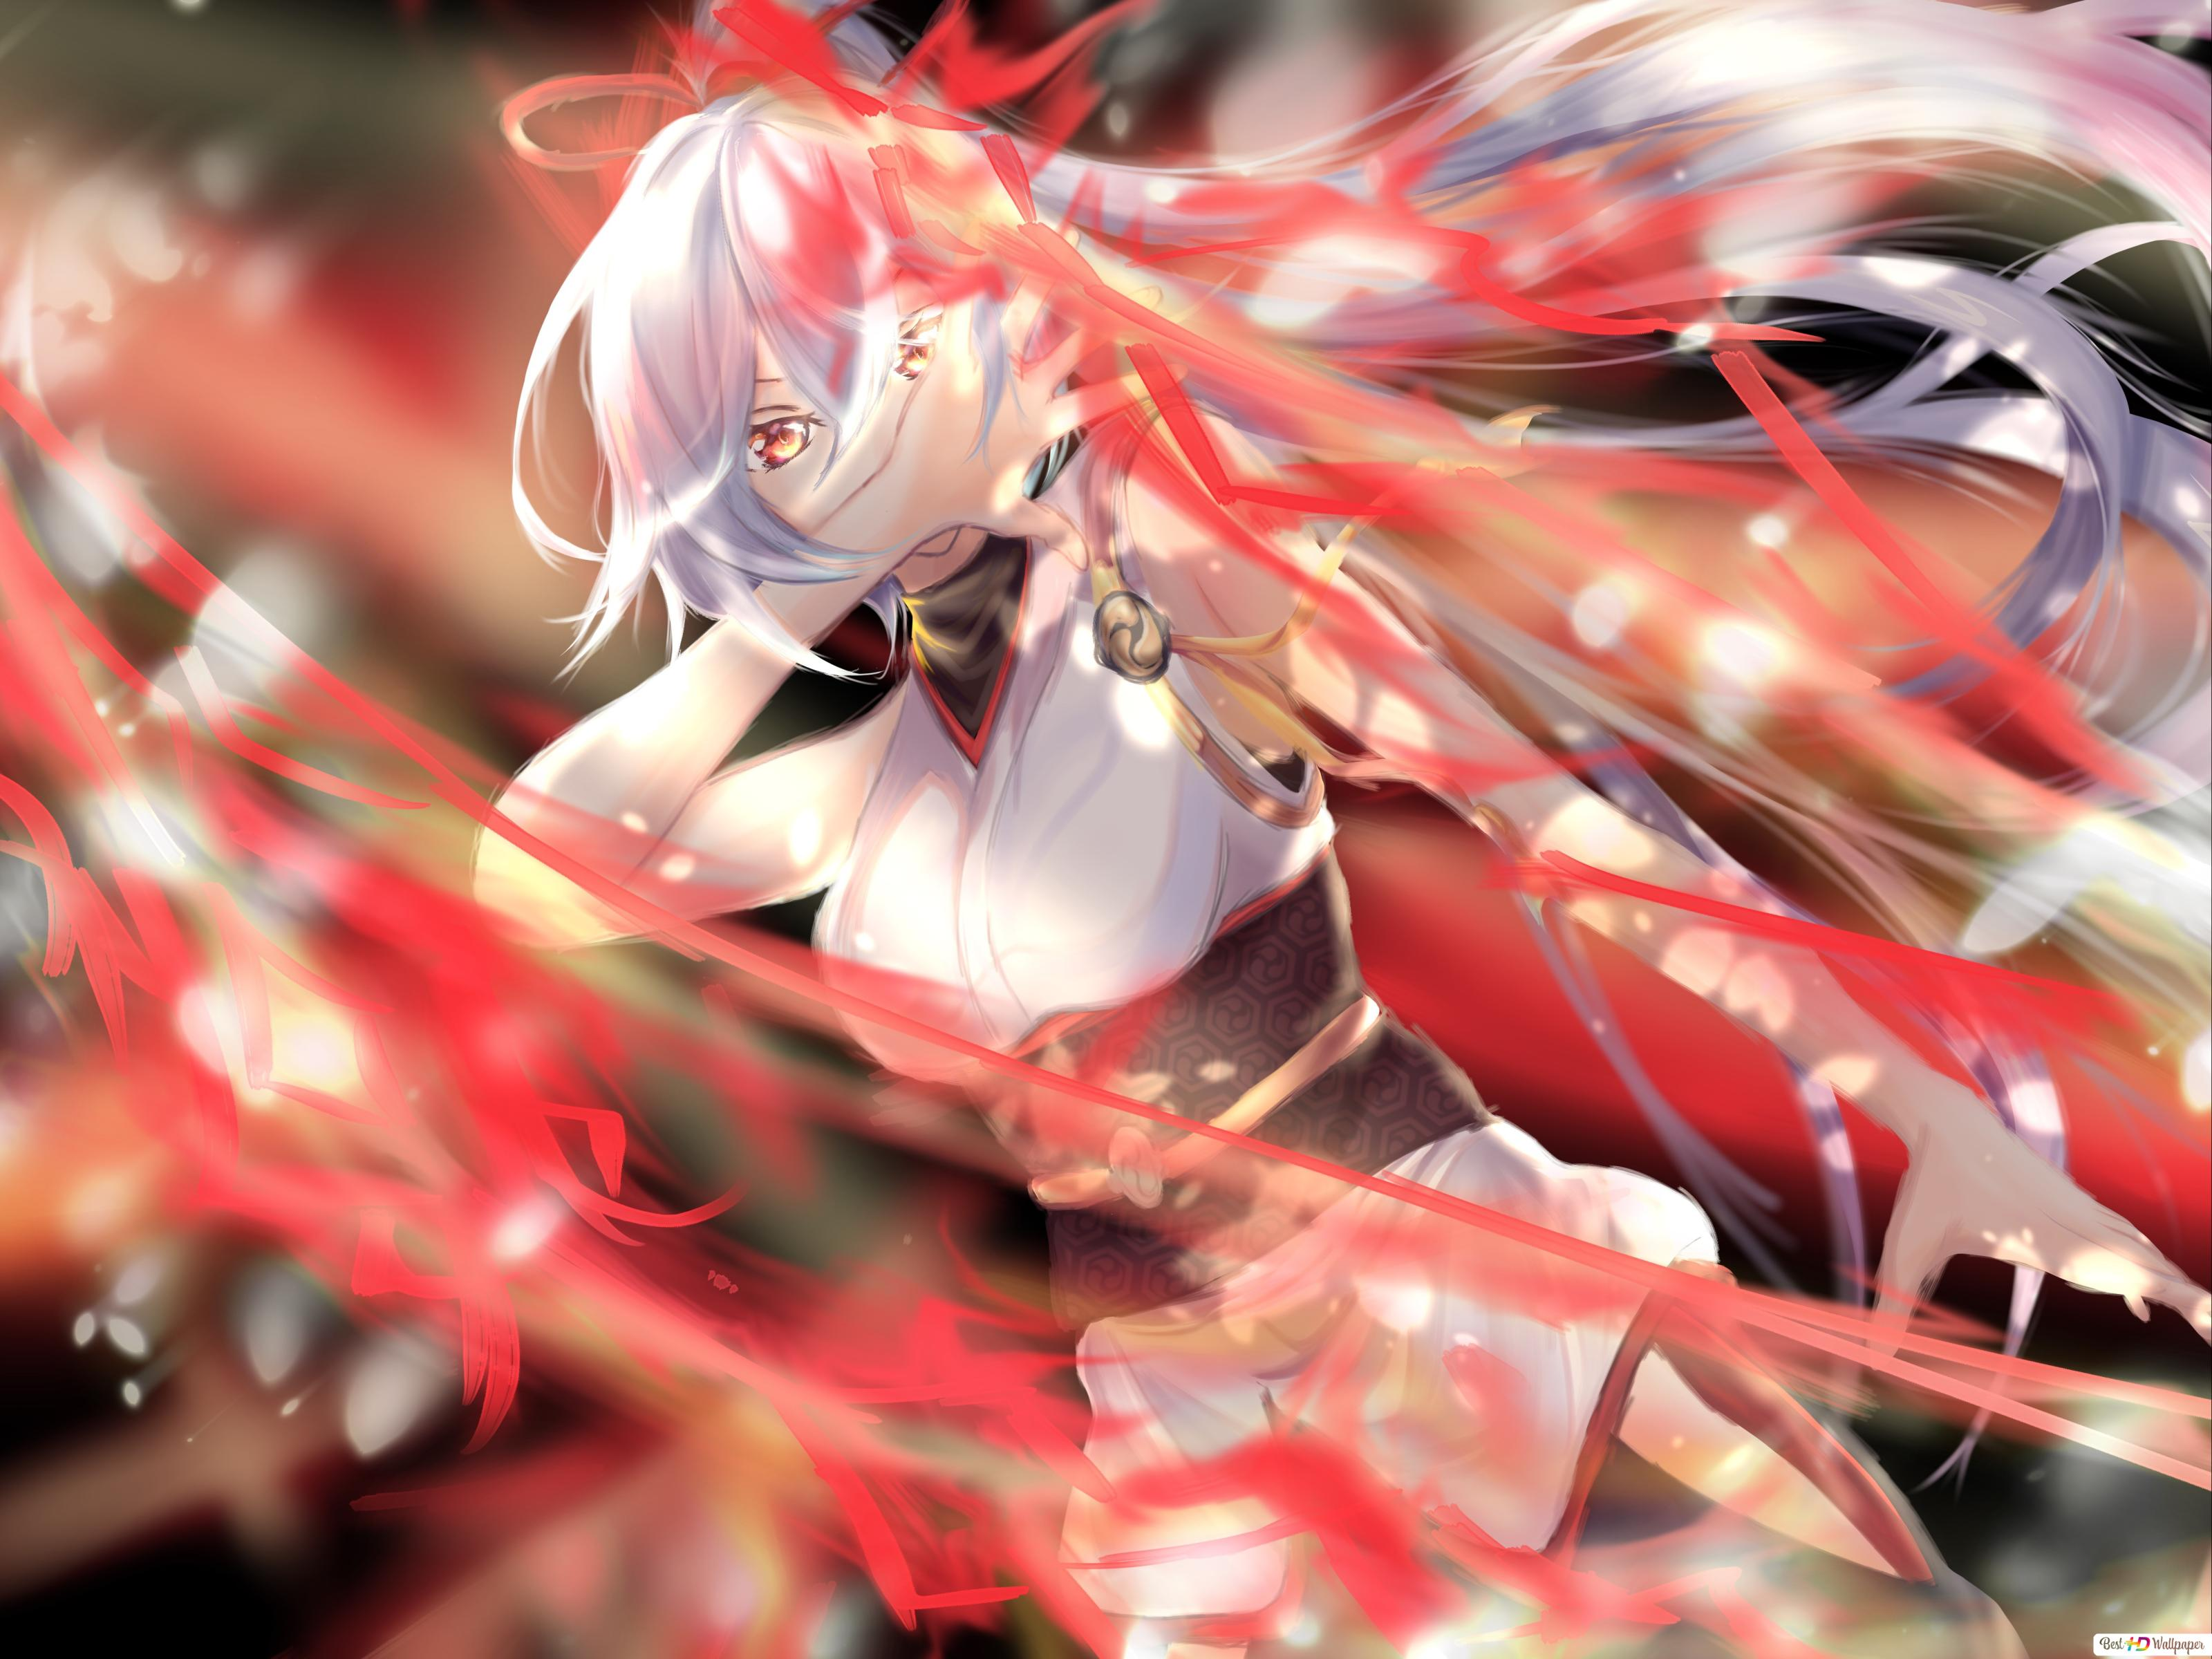 Fate Grand Order Archer Inferno Hd Wallpaper Download